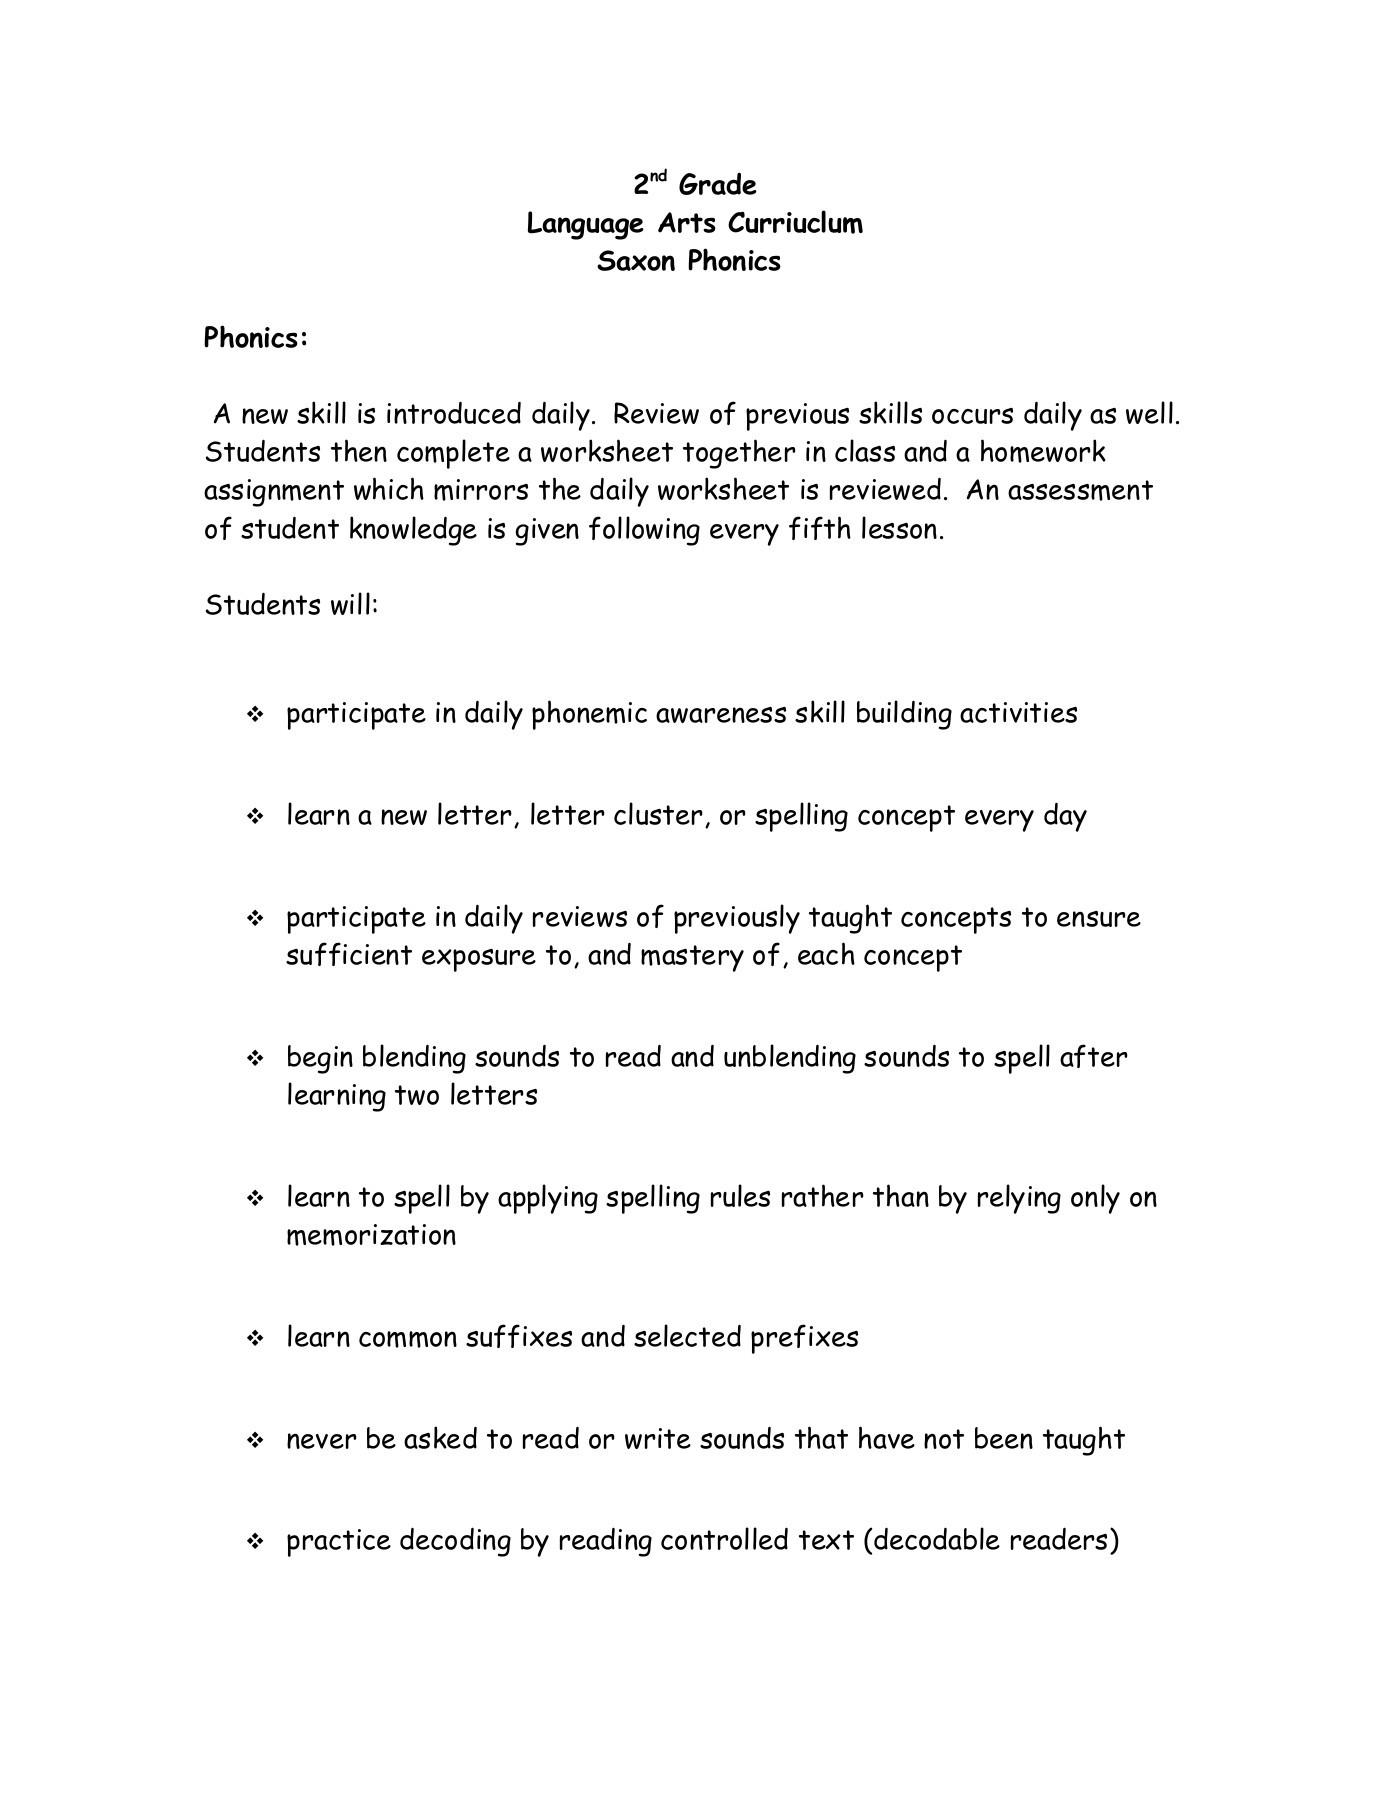 hight resolution of 2nd Grade Language Arts Curriuclum Saxon Phonics Pages 1 - 5 - Flip PDF  Download   FlipHTML5